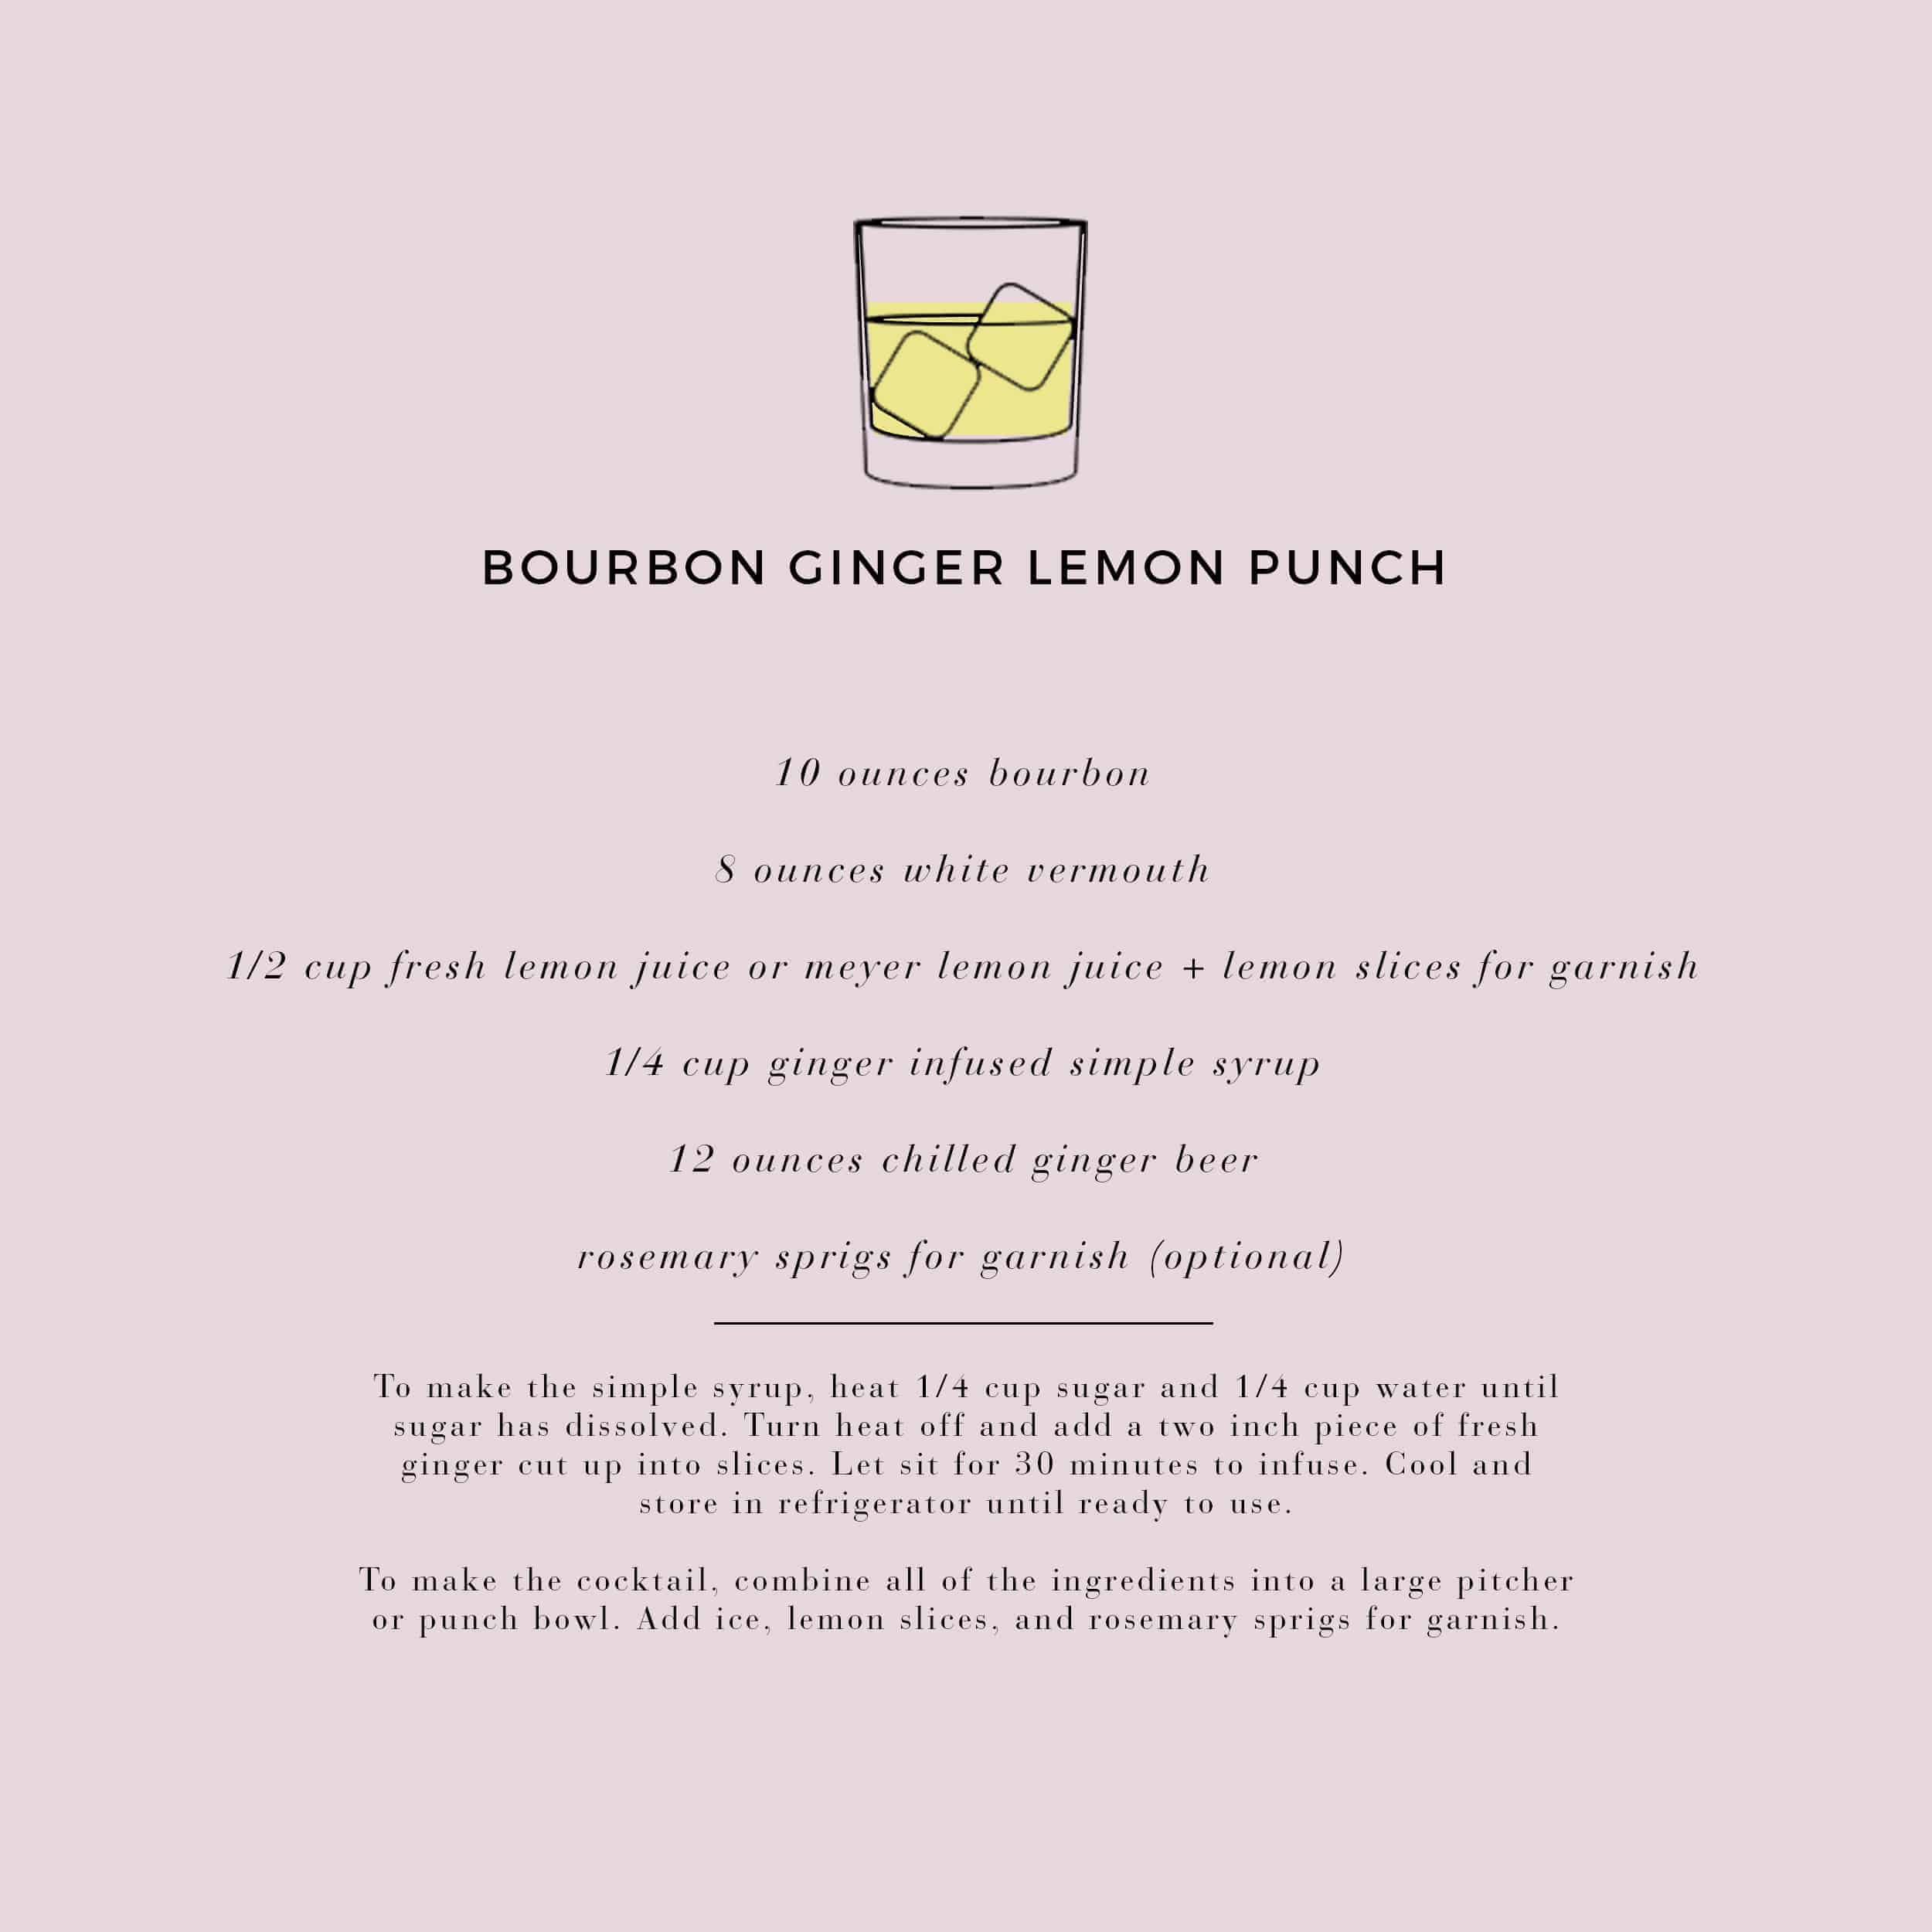 Emily Henderson Waverly Modern English Tudor Holiday Gathering Party Patio Recipe Bourbon Ginger Lemon Punch Recipe Card2